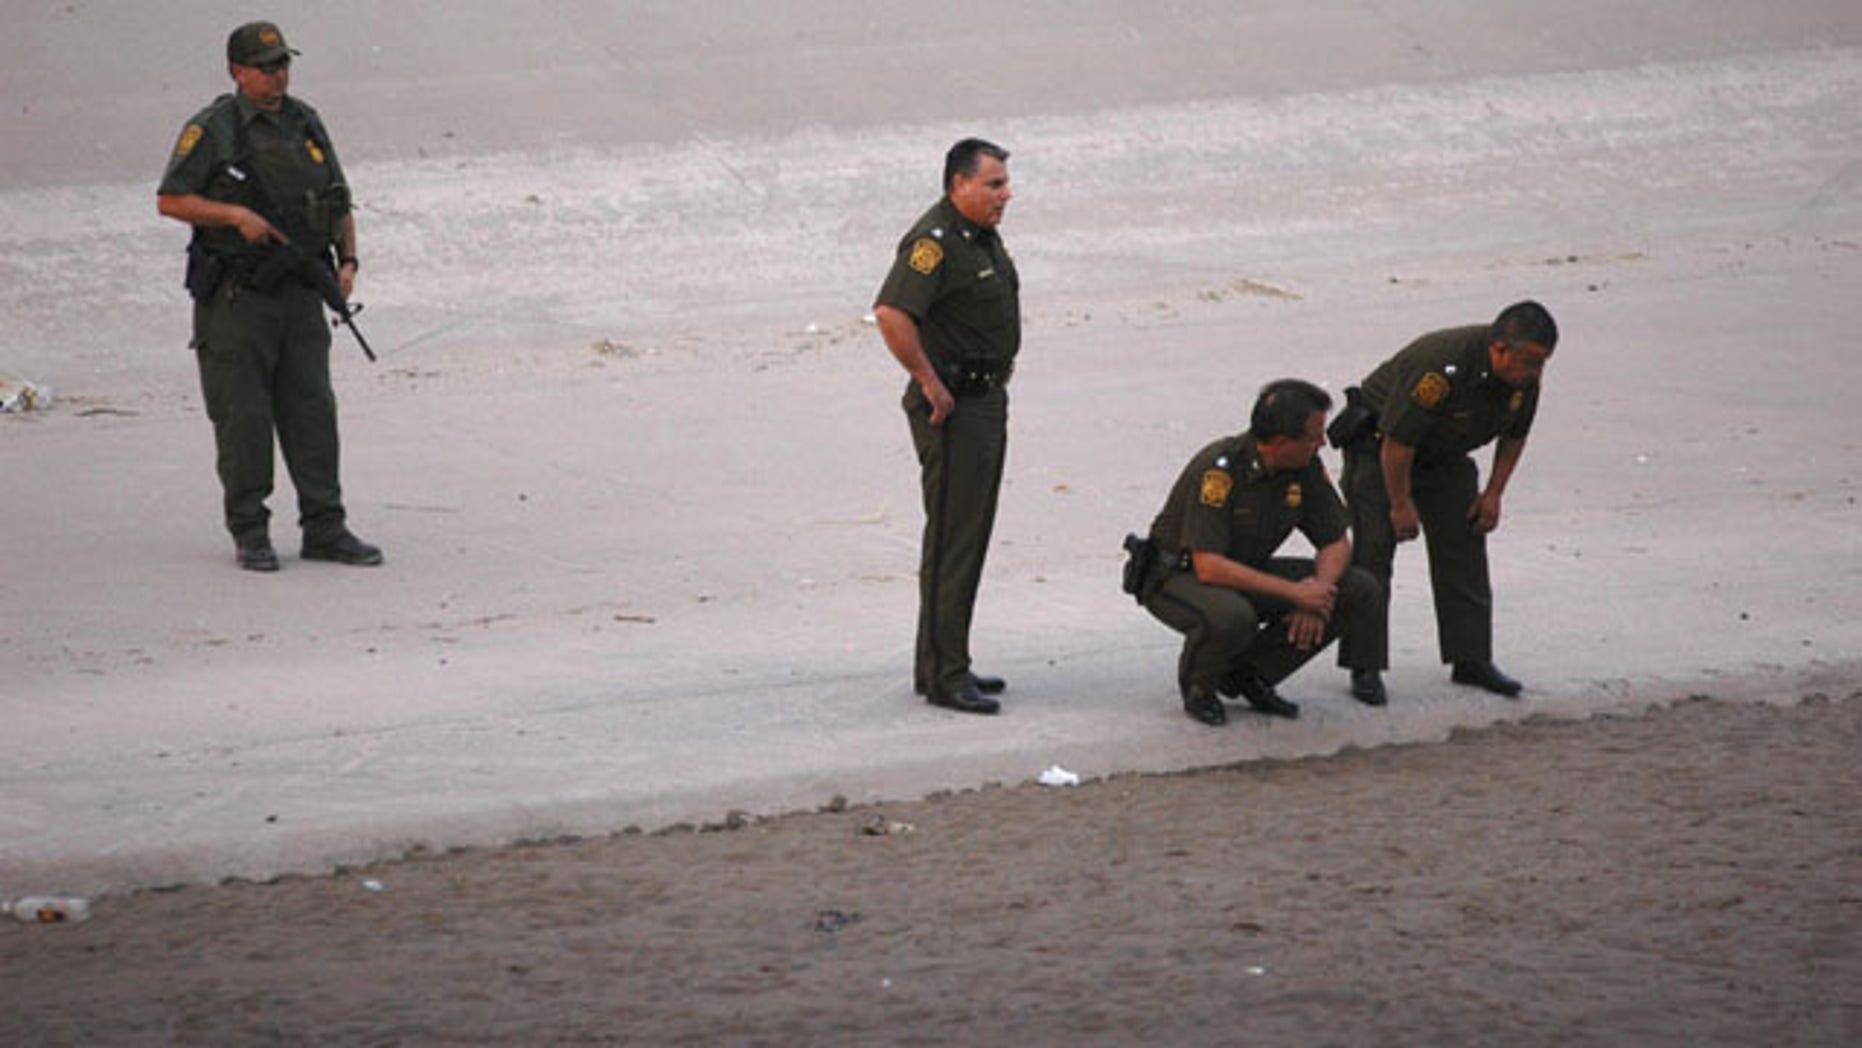 FILE - In this June 7, 2010, file photo, U.S. border patrol agents examine the area near where 14-year-old Mexican youth Sergio Adrian Hernandez Huereca was killed, allegedly shot by a U.S. Border Patrol agent after a confrontation under the Paso Del Norte border bridge in Ciudad Juarez, Mexico. (AP Photo)